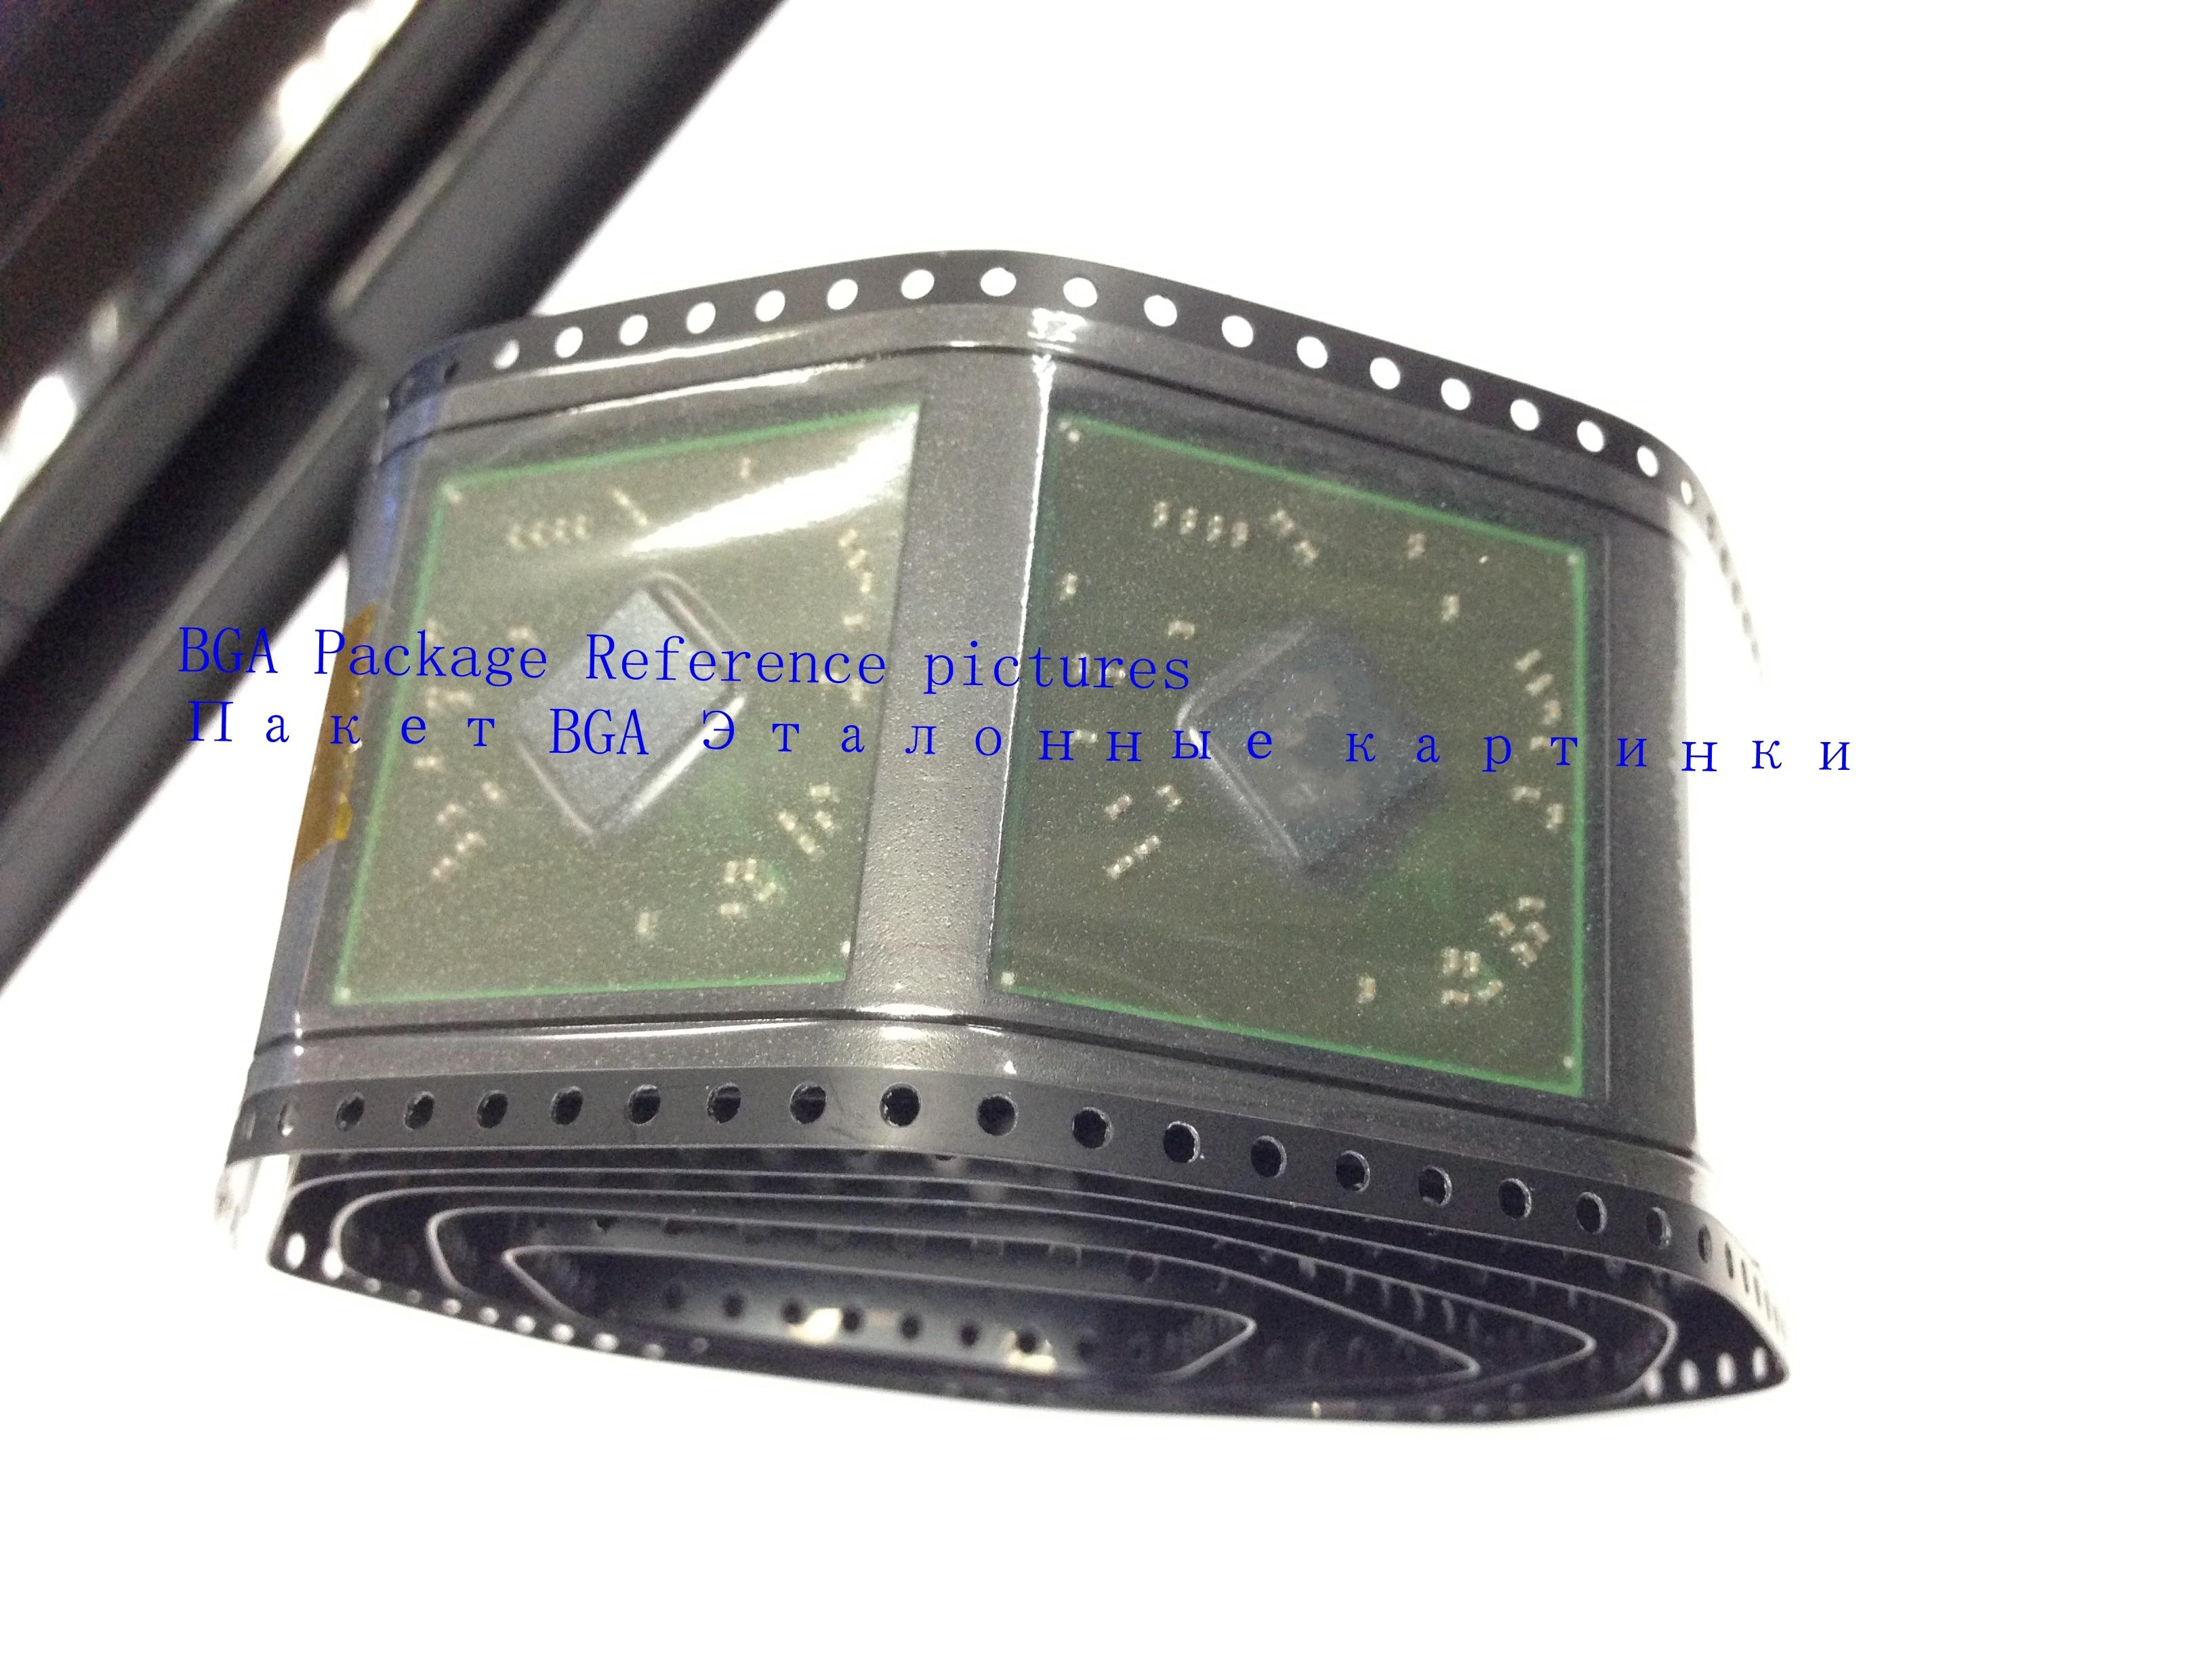 1pcs/lot 100% New AM7410JBY44JB BGA Chipset1pcs/lot 100% New AM7410JBY44JB BGA Chipset